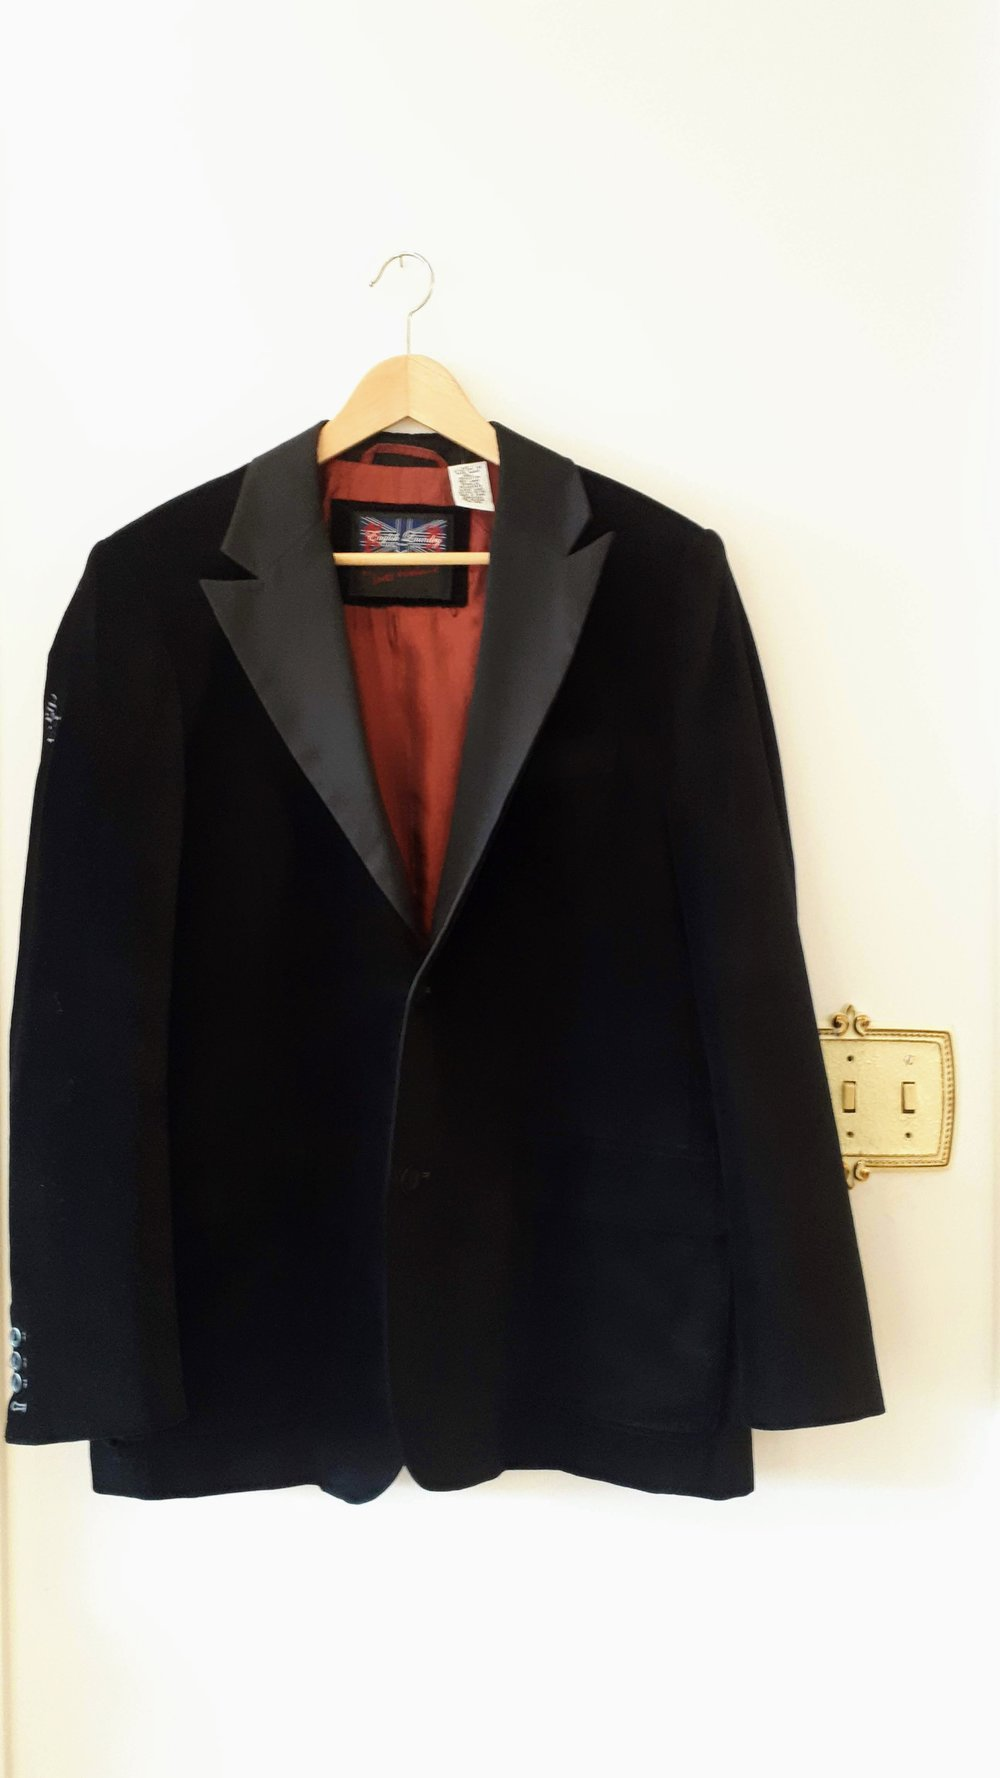 English Laundry mens jacket; Size L, $62